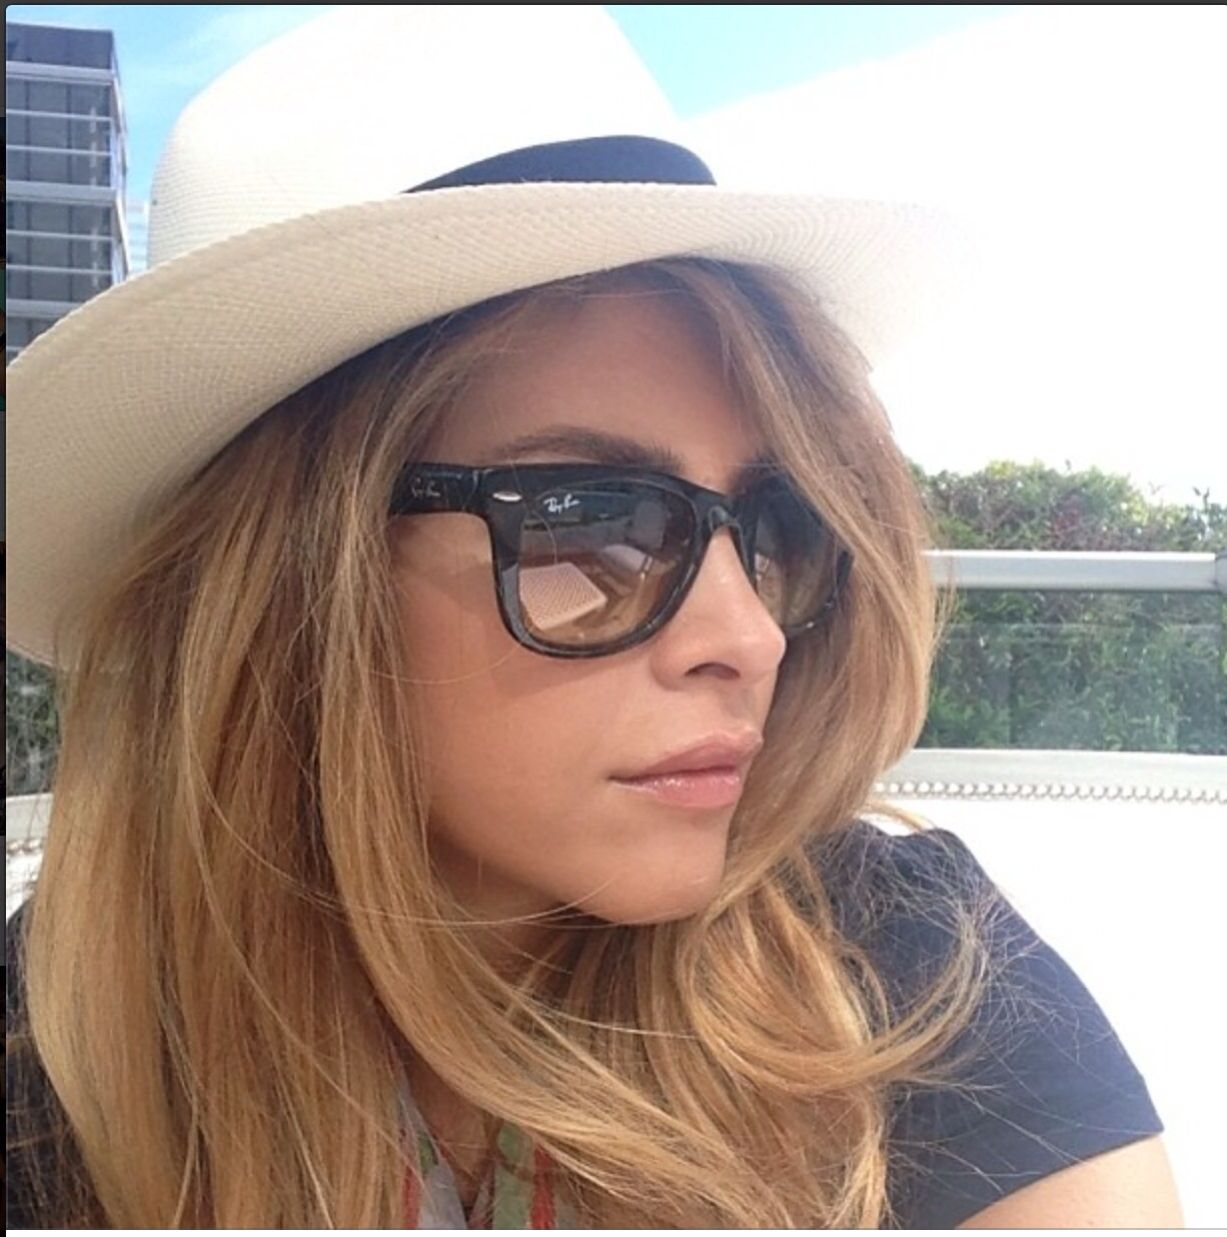 Shiva Safai Amazing Hat And Glasses Perfect Lips Sunglasses Shiva Safai Fashion Sunglasses